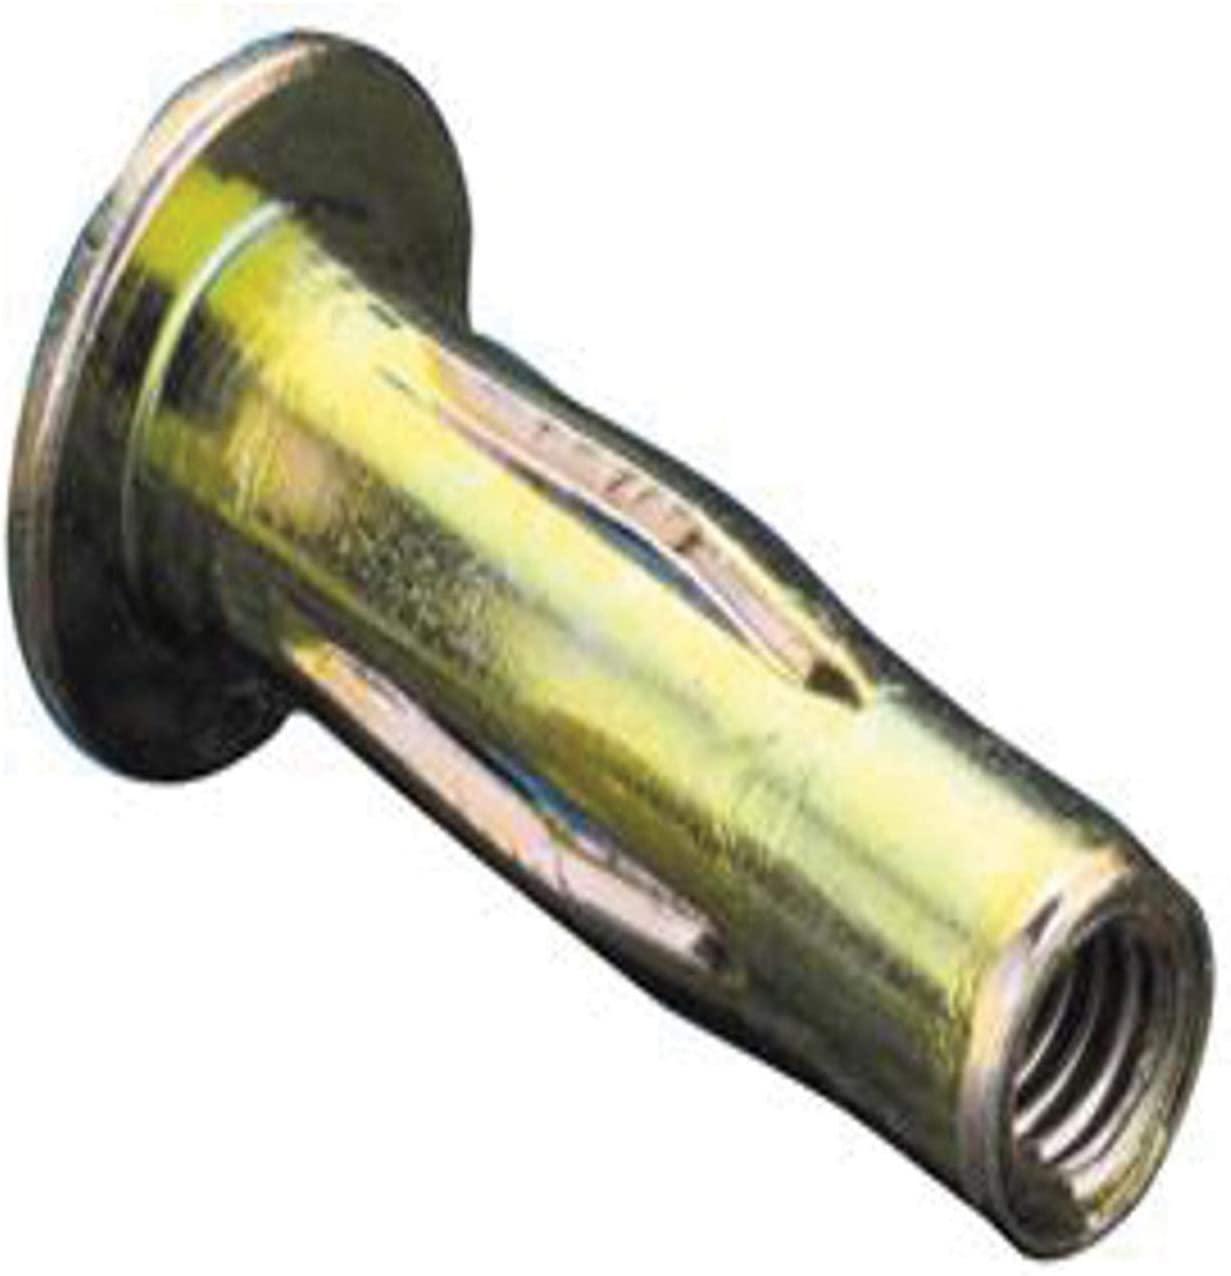 AES10P320PBZYR, Slotted Body Insert, 10-32 (.175-.320 GR) Pre-Bulbed Body, LG FLNG HD, Steel, Zinc YLW (100 PK)